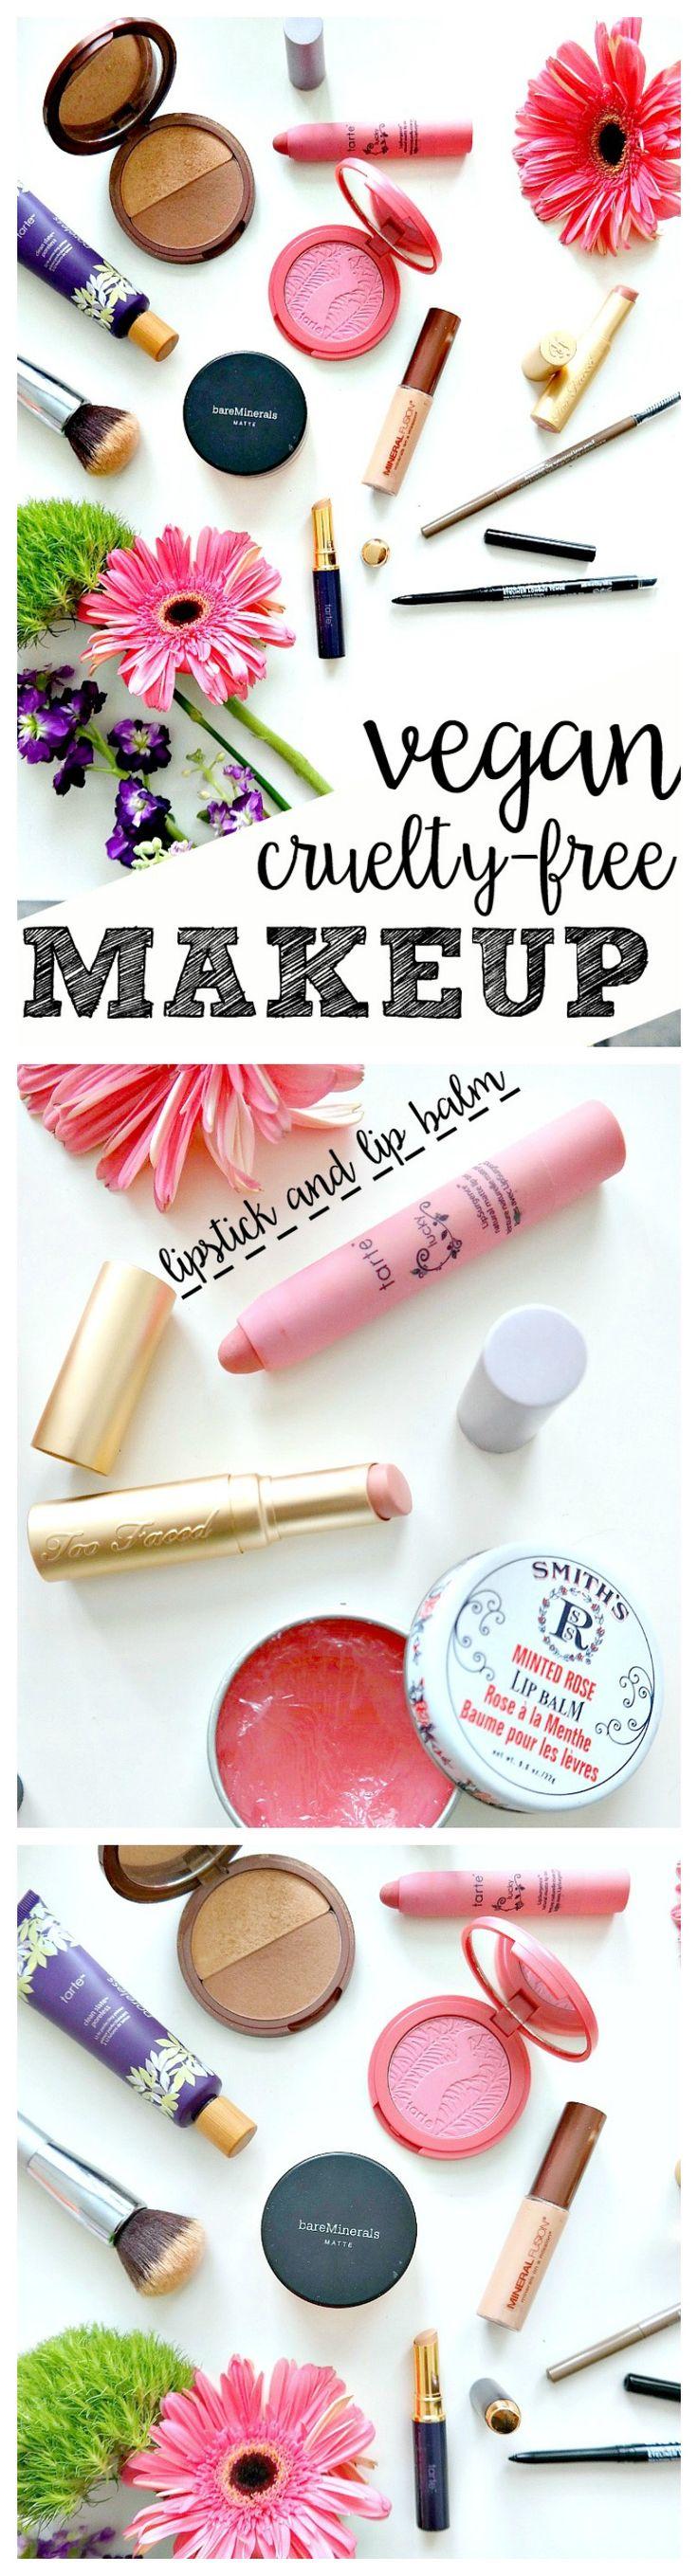 My Vegan & Cruelty Free Makeup Essentials. Primer, Concealer, Mineral Foundation & Powder, Mascara, Brows, Eyeliner, Lipsticks and more! From The Glowing Fridge. #vegan #crueltyfree #makeup